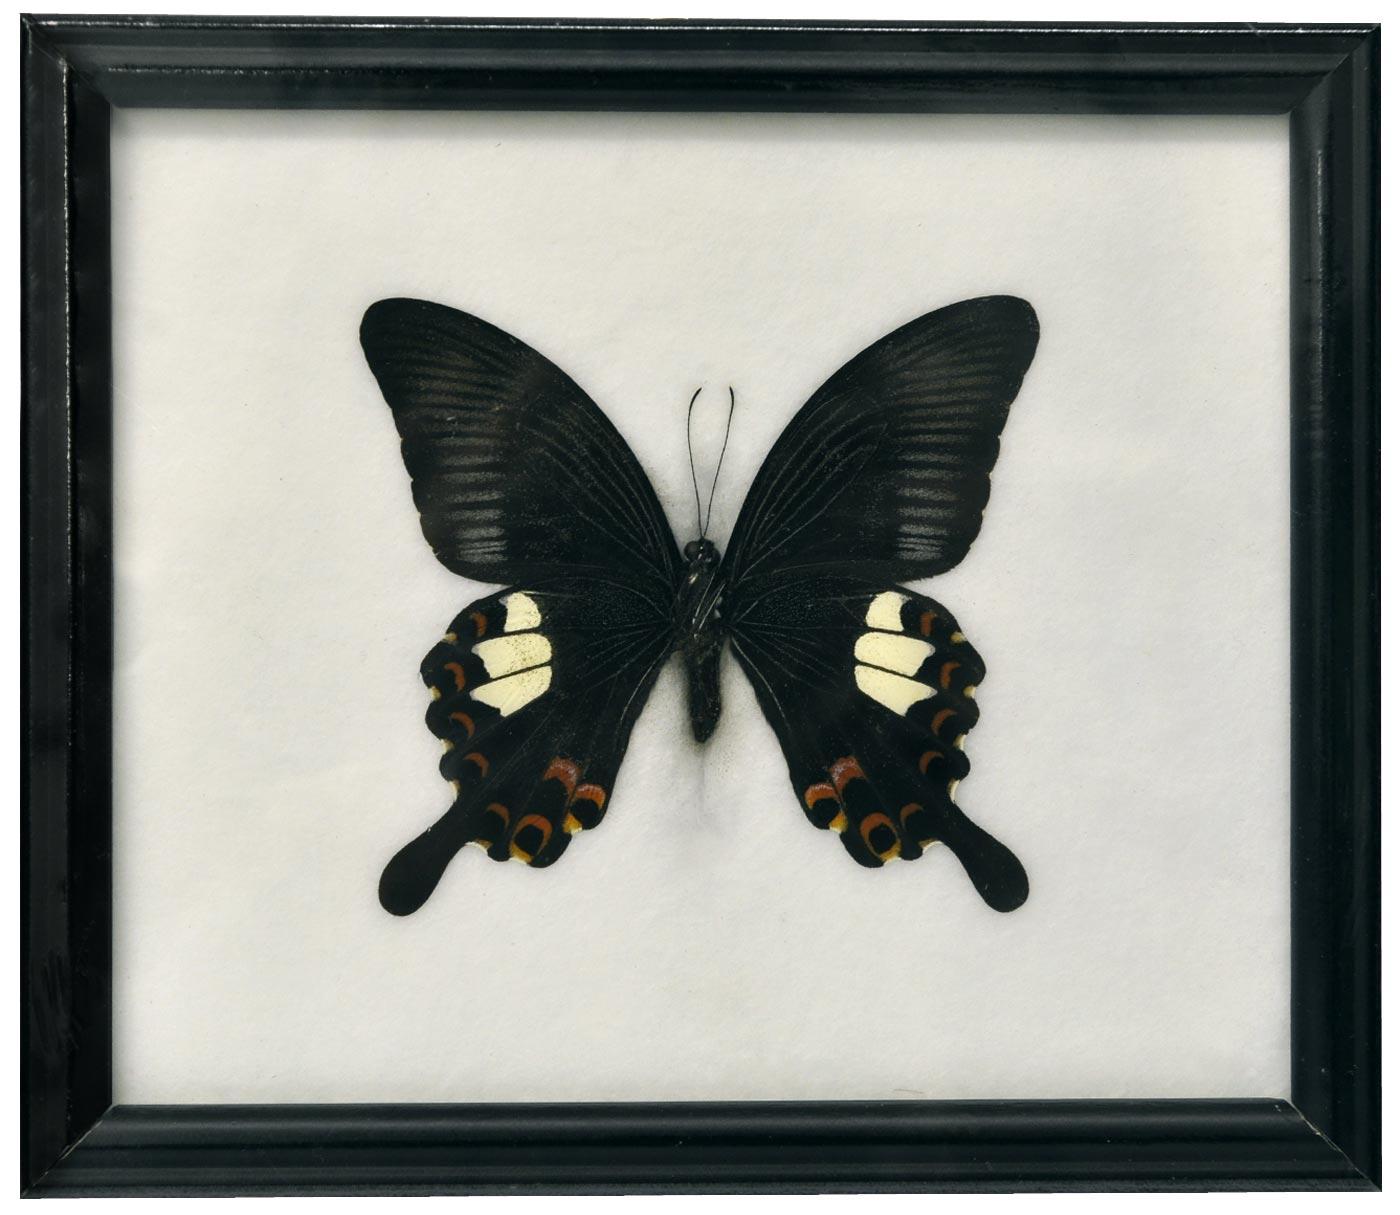 Nett Schmetterling Bilderrahmen Bilder - Rahmen Ideen ...